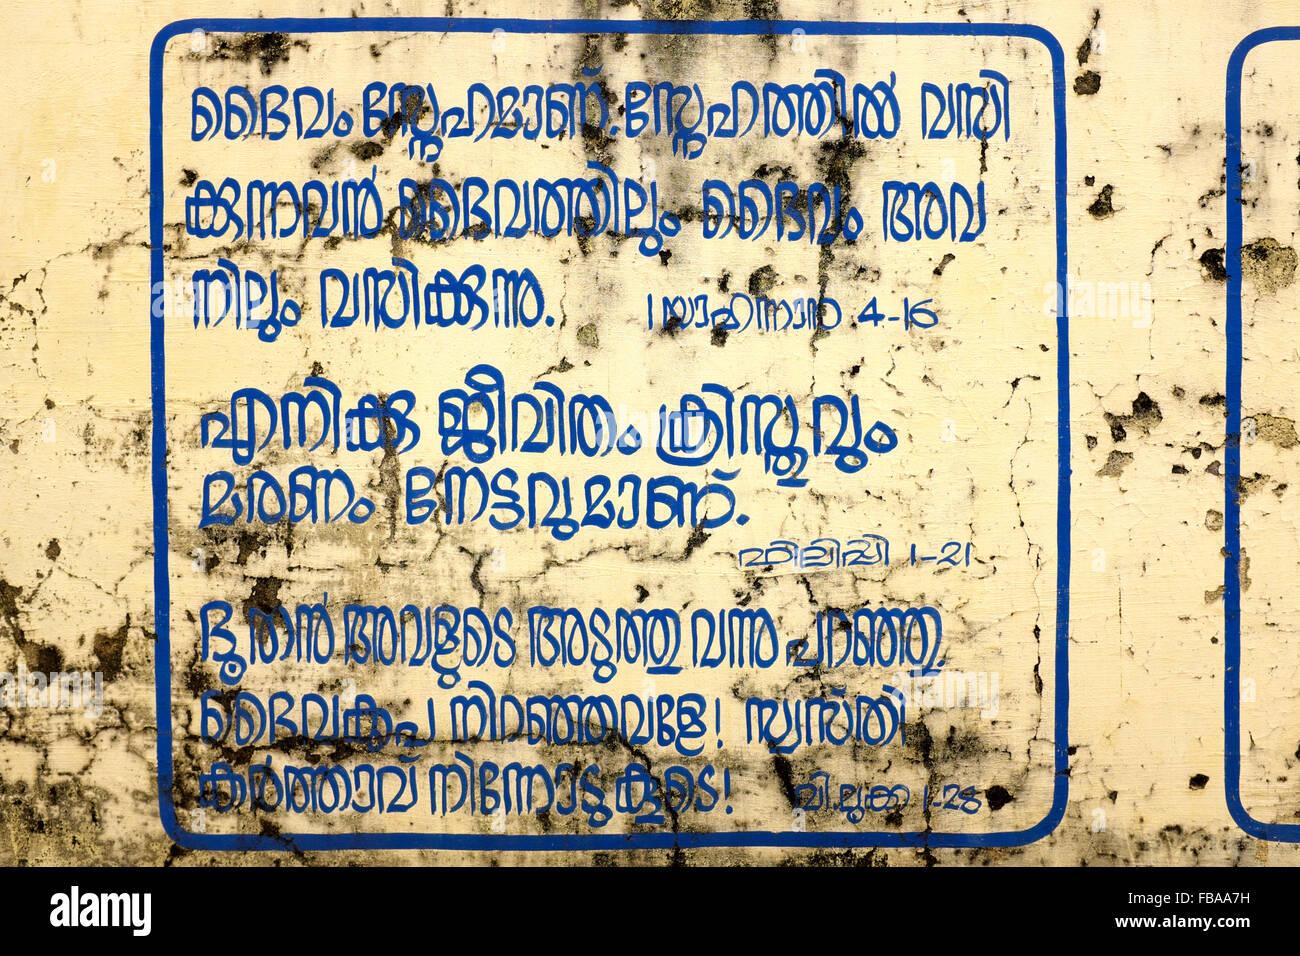 Malayalam script on a wall in Allepuzha (Alleppey), Kerala